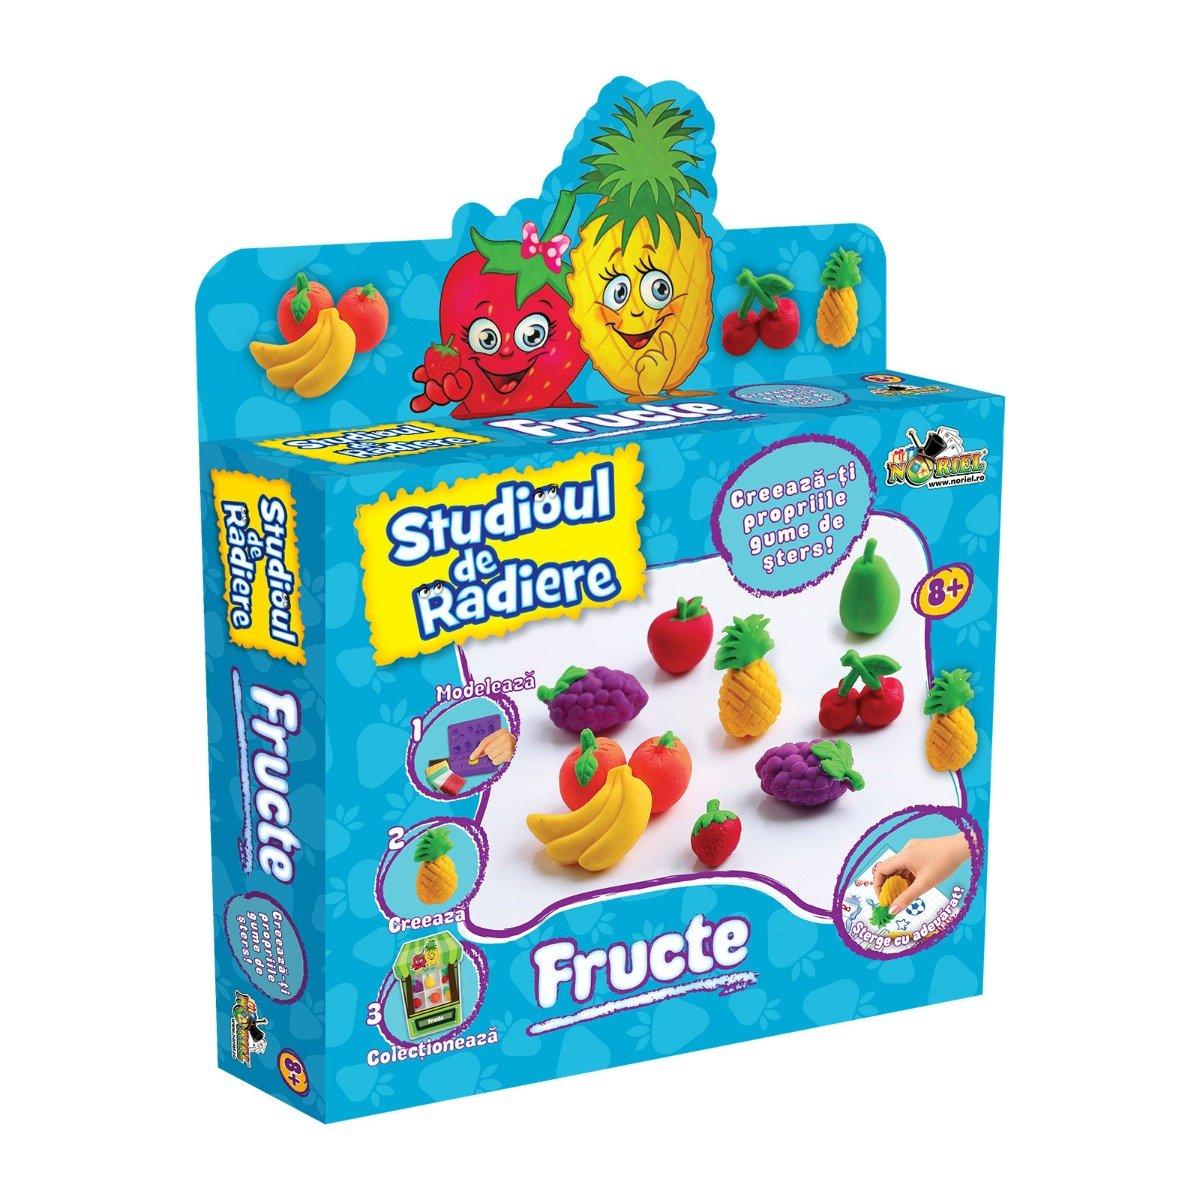 Set de modelat Noriel Studioul de radiere - Fructe